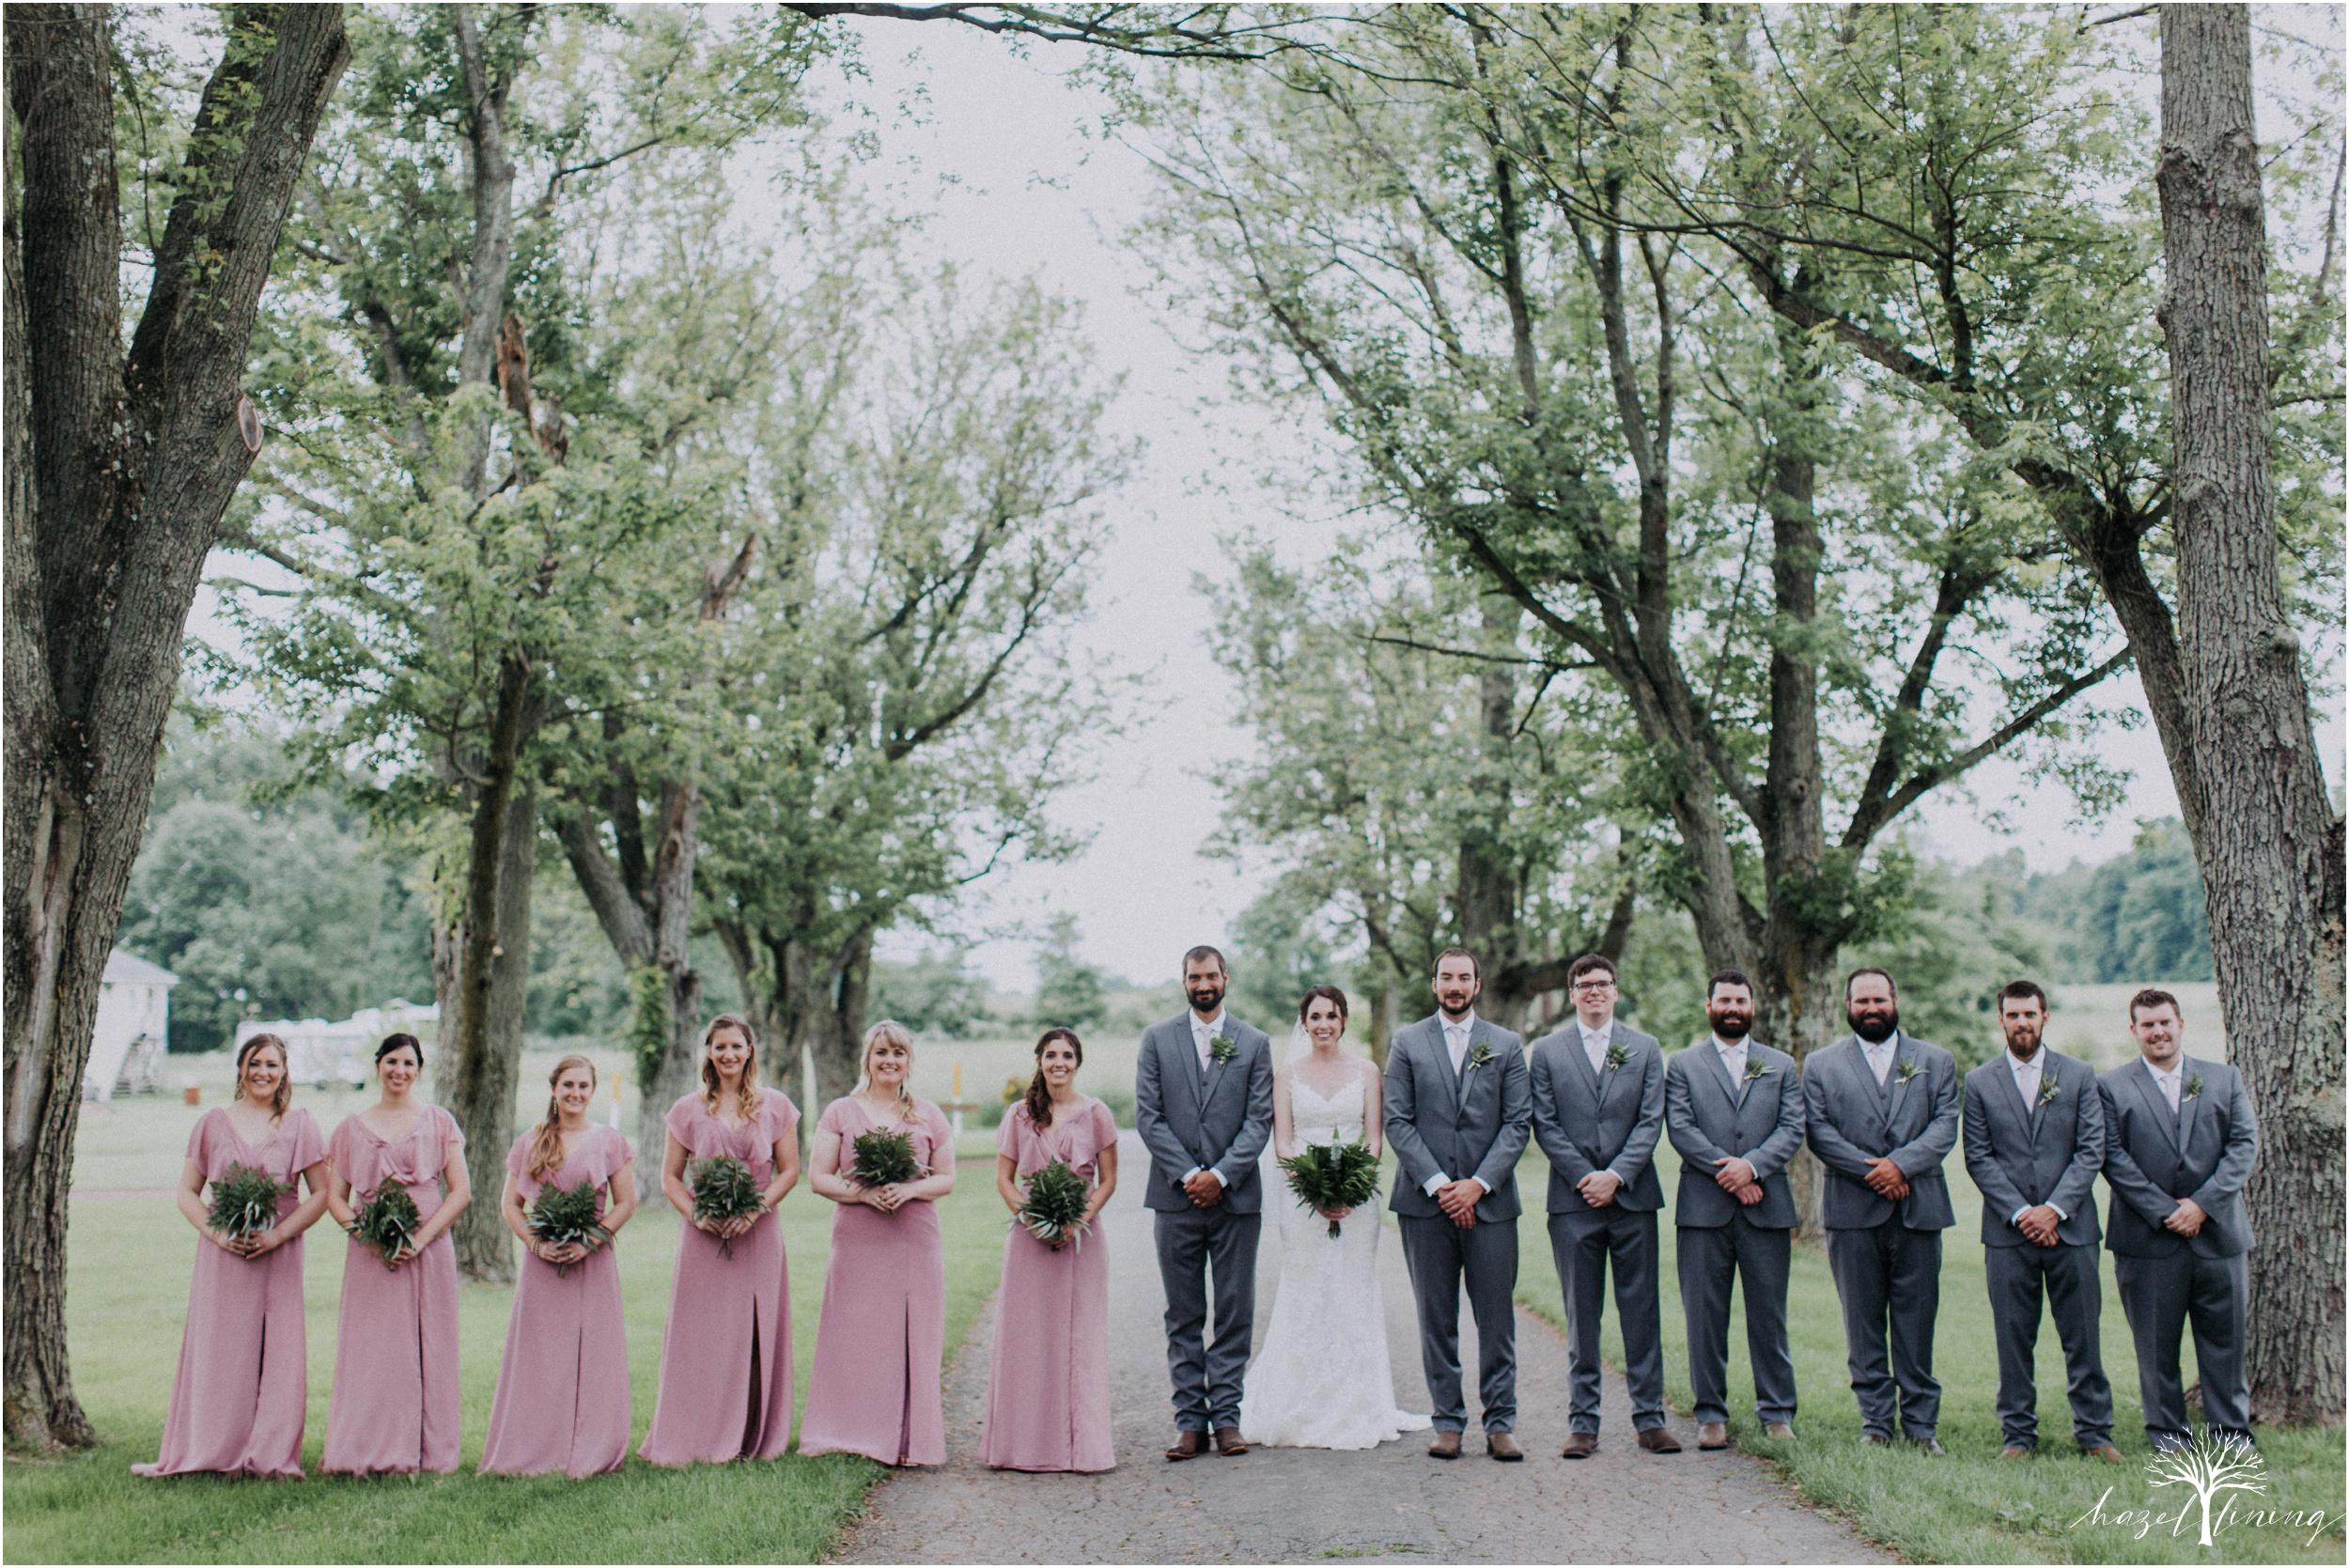 hazel-lining-travel-wedding-elopement-photography-lisa-landon-shoemaker-the-farm-bakery-and-events-bucks-county-quakertown-pennsylvania-summer-country-outdoor-farm-wedding_0071.jpg